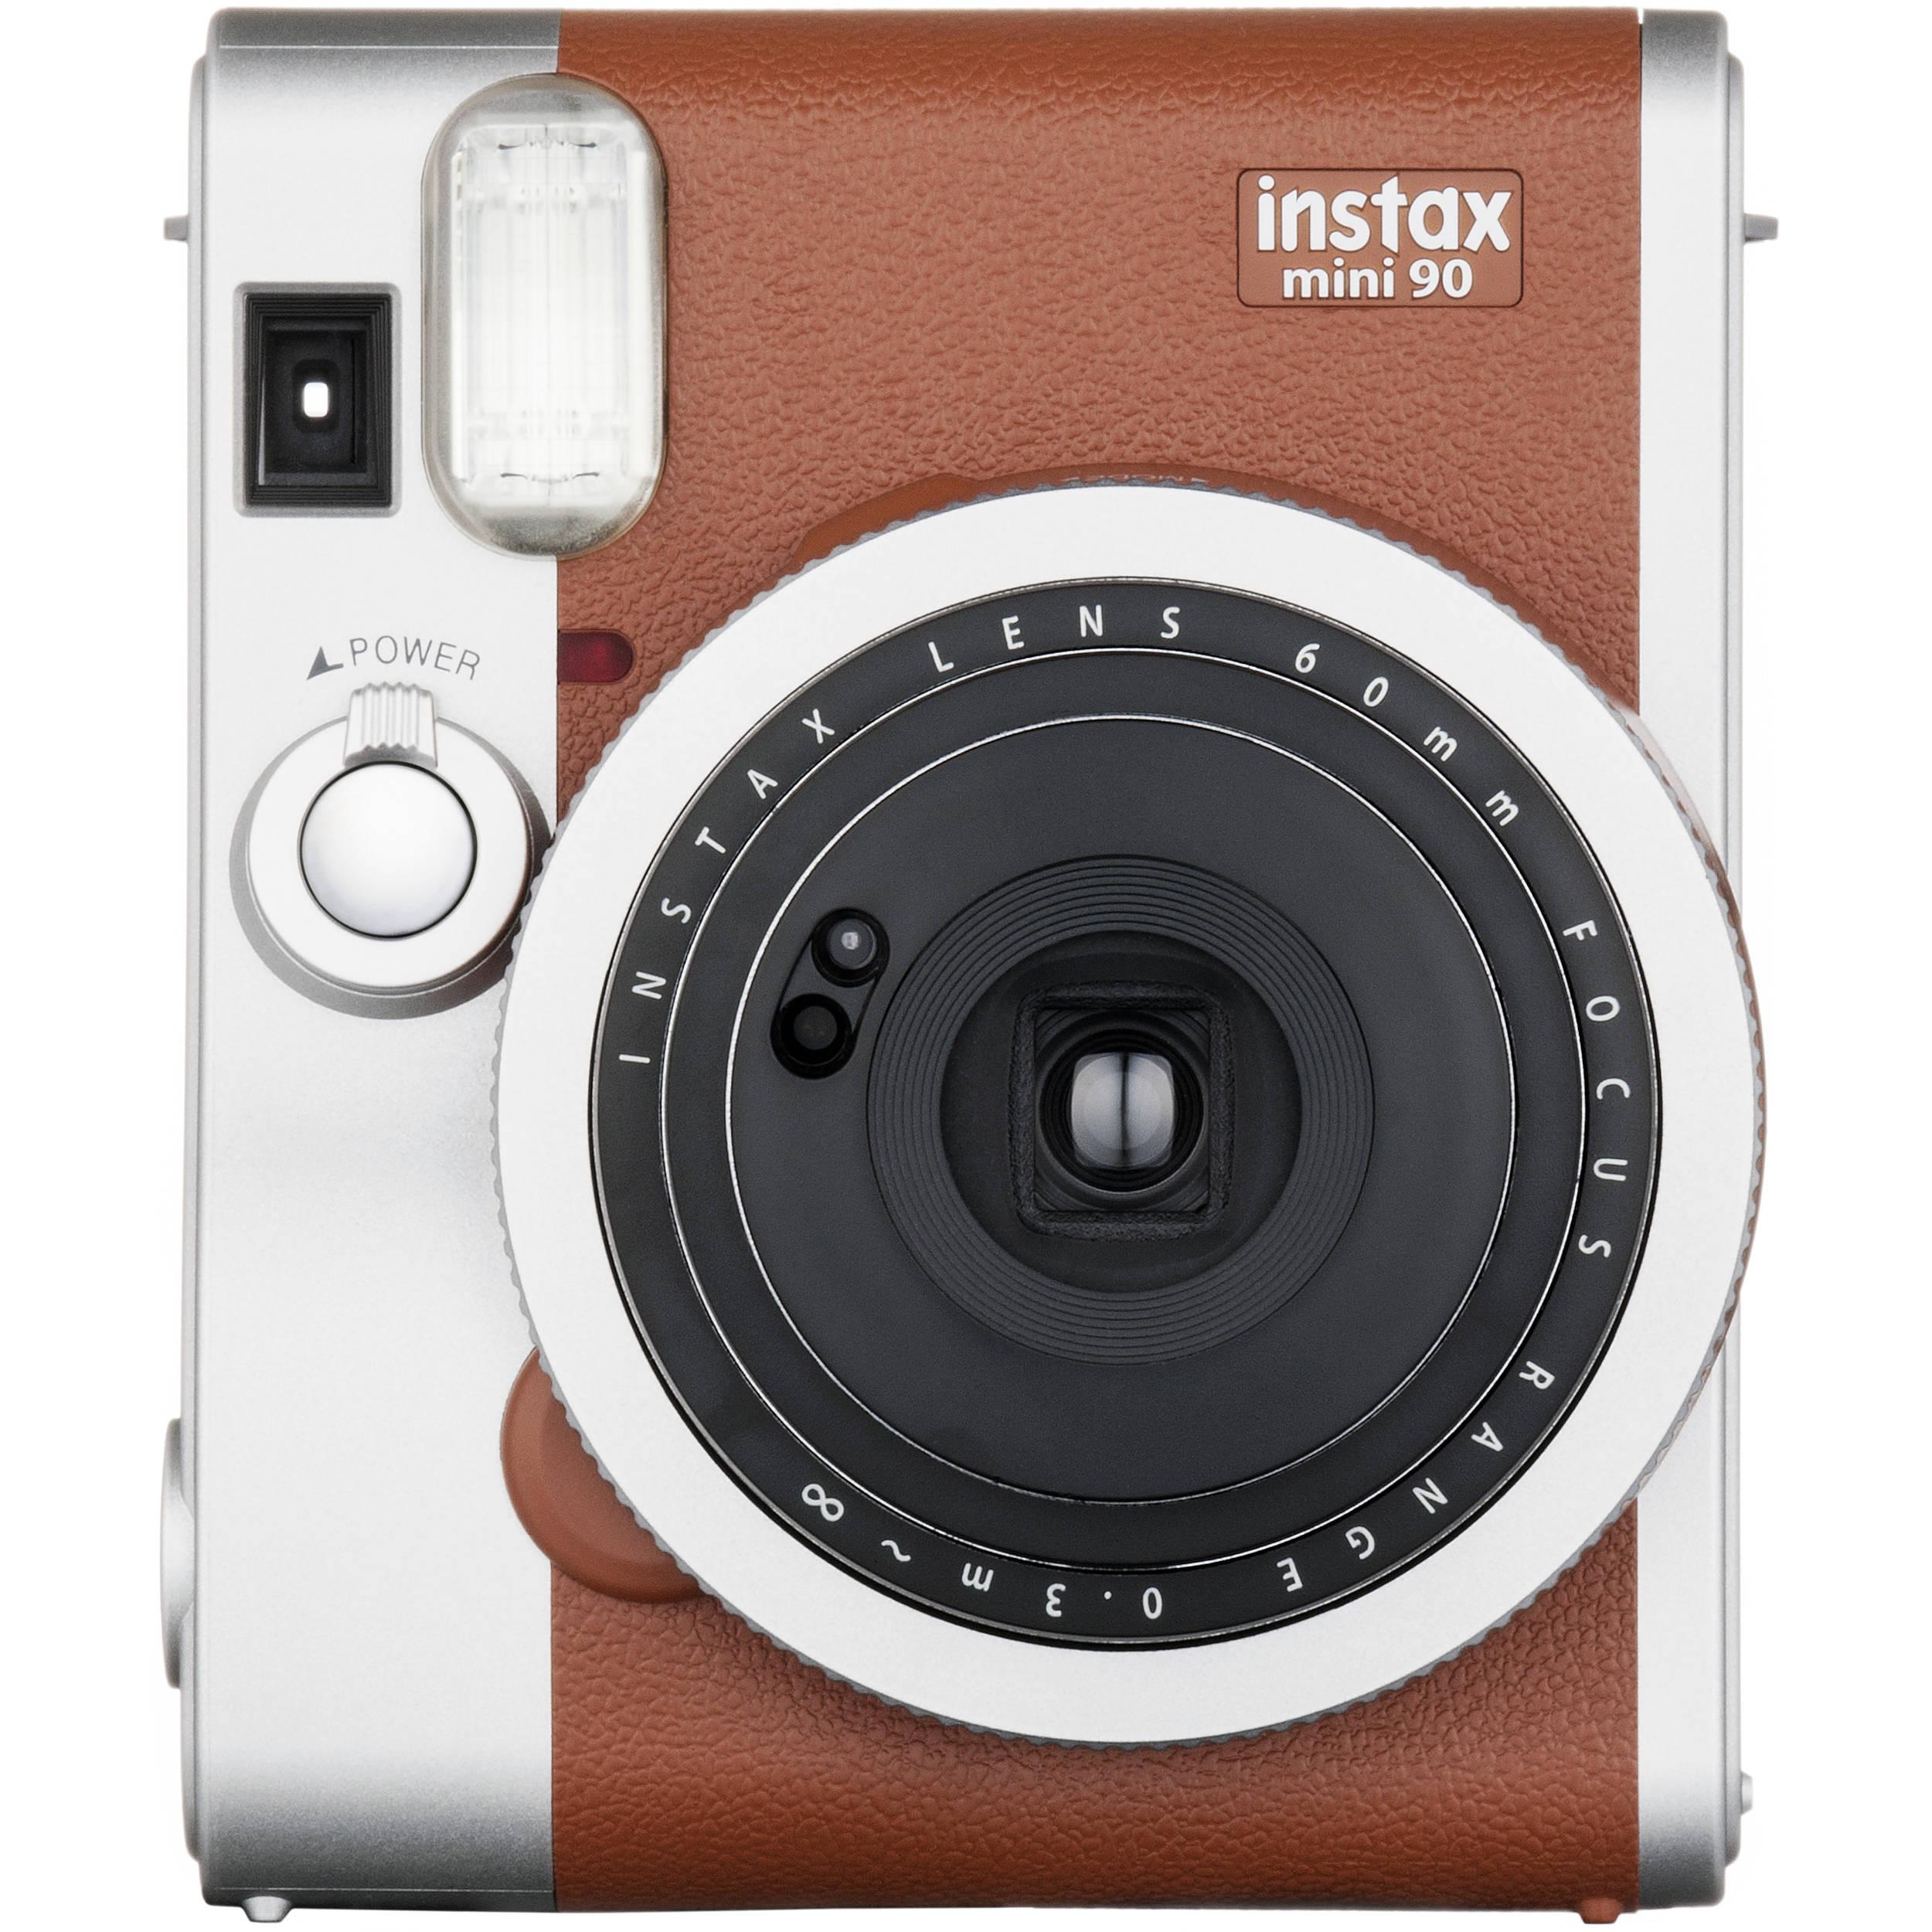 8de02e7ecbc295 Fujifilm Instax Cameras  What You Need to Know to Get Started